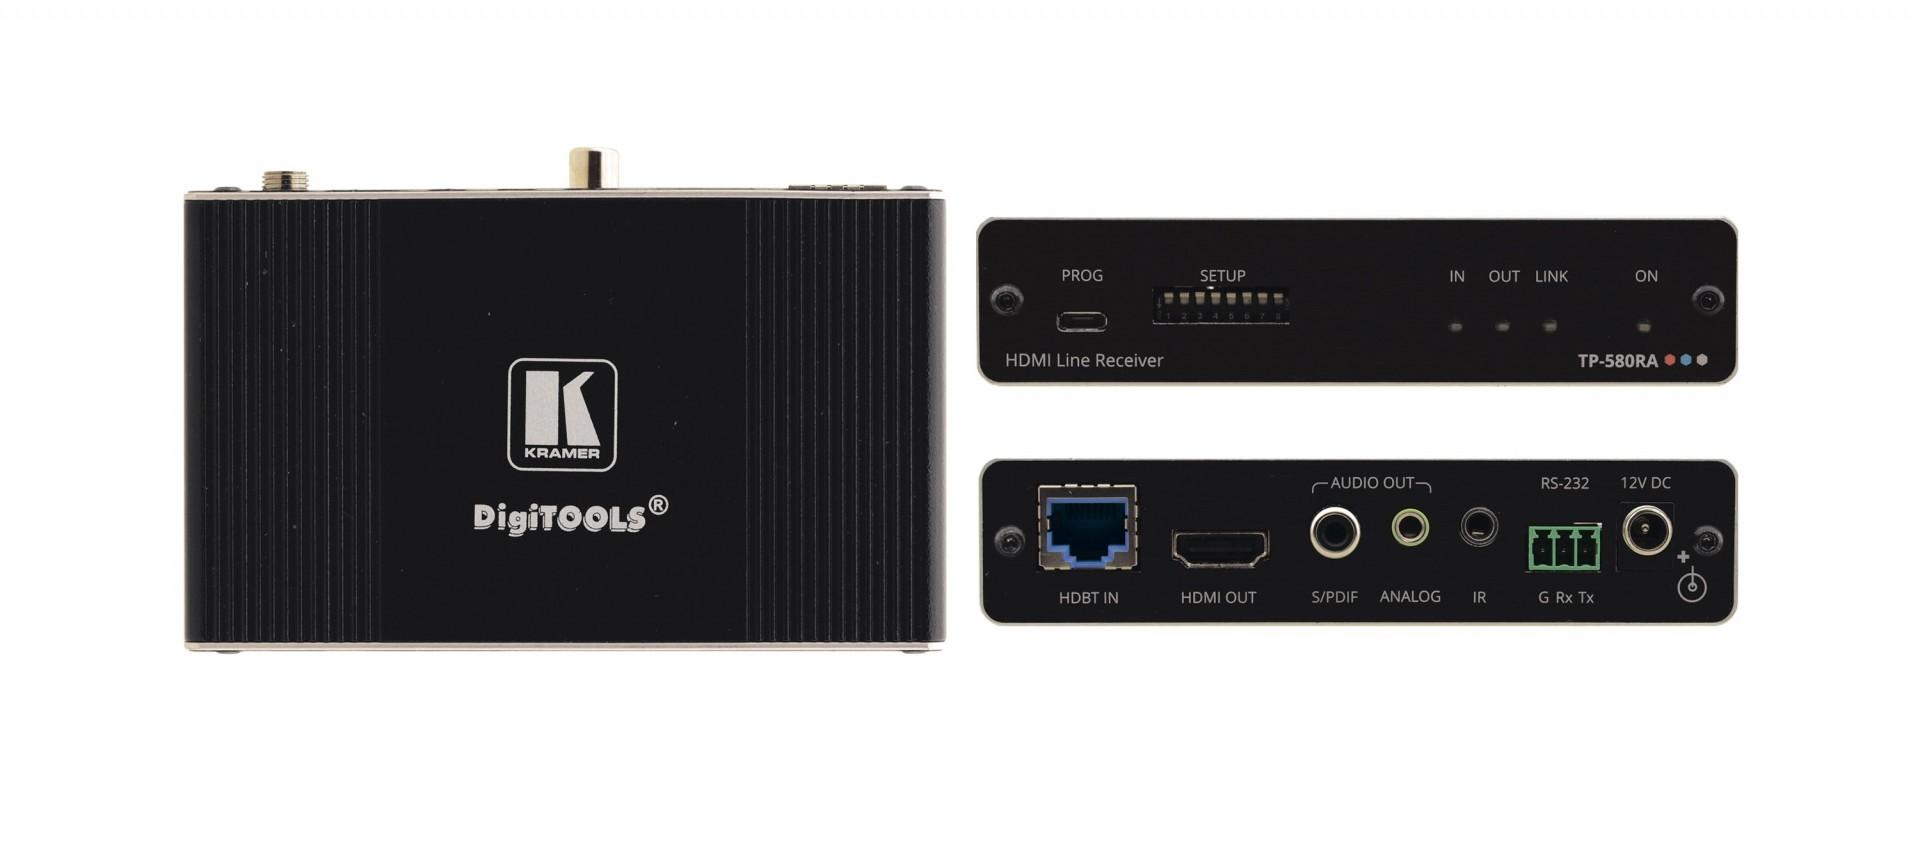 Kramer TP-580RA - 4K60 4:2:0 HDMI Receiver